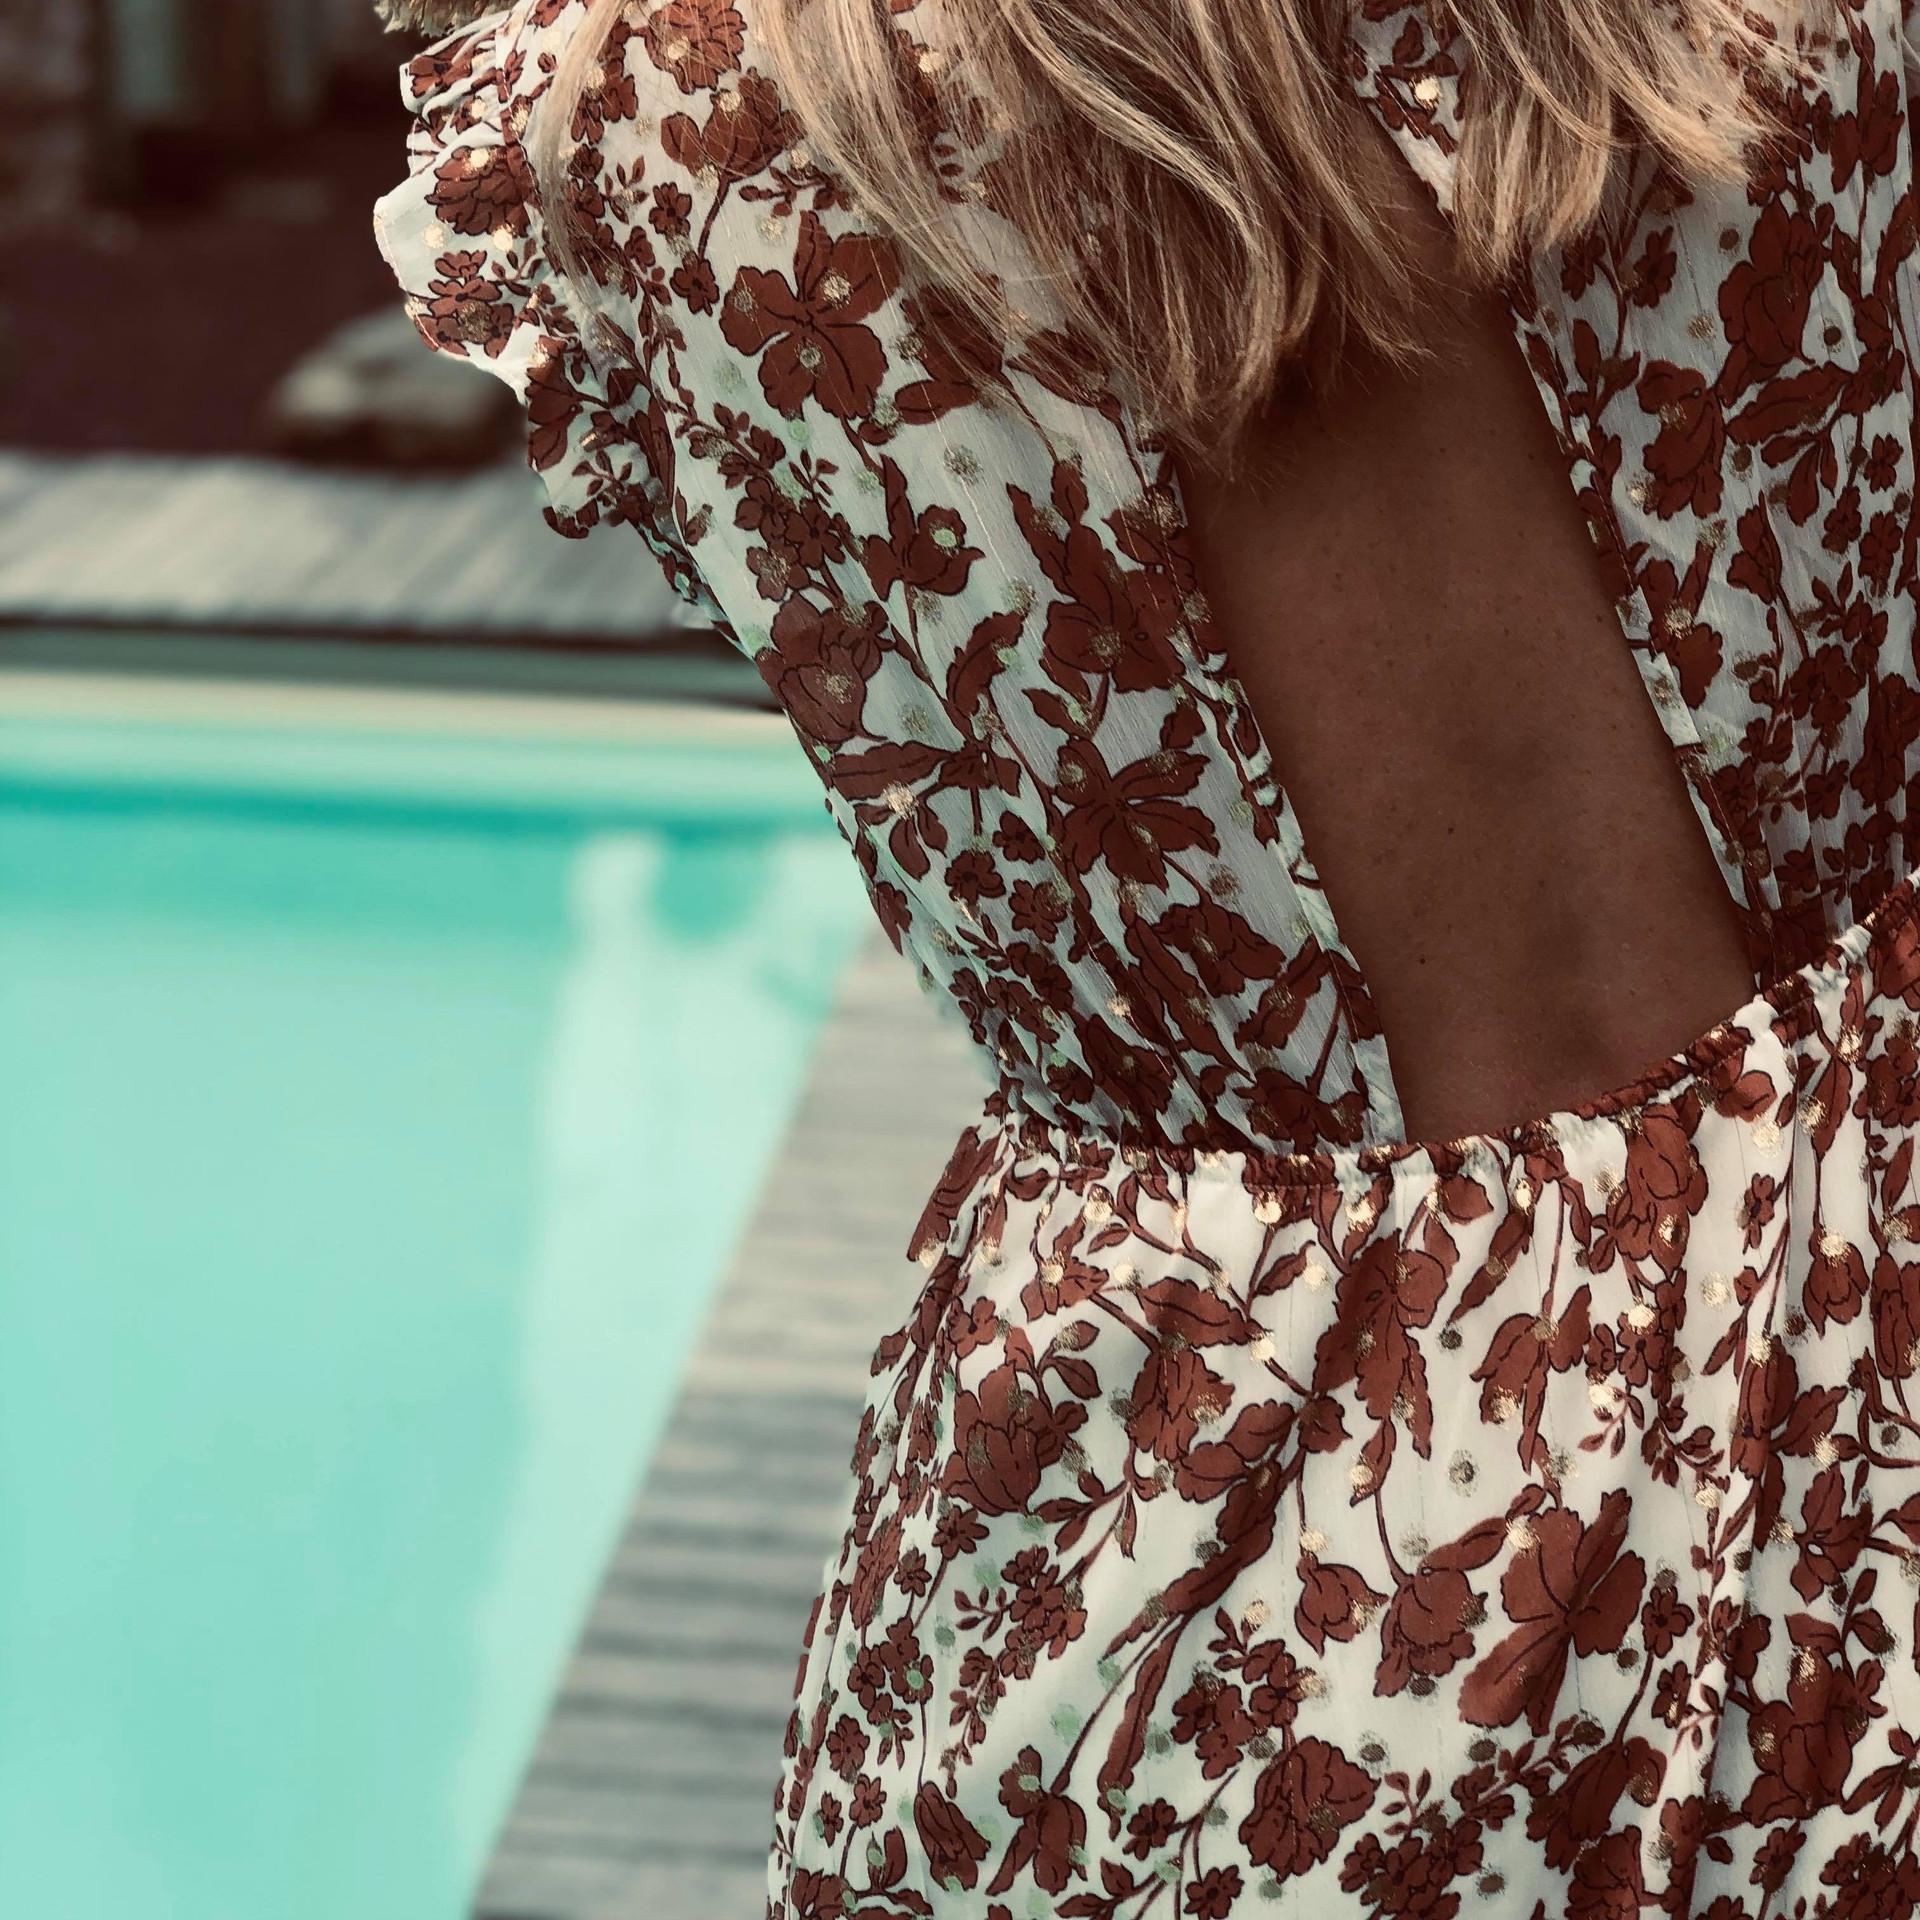 Shooting summer 2019 - Une copine m'a dit